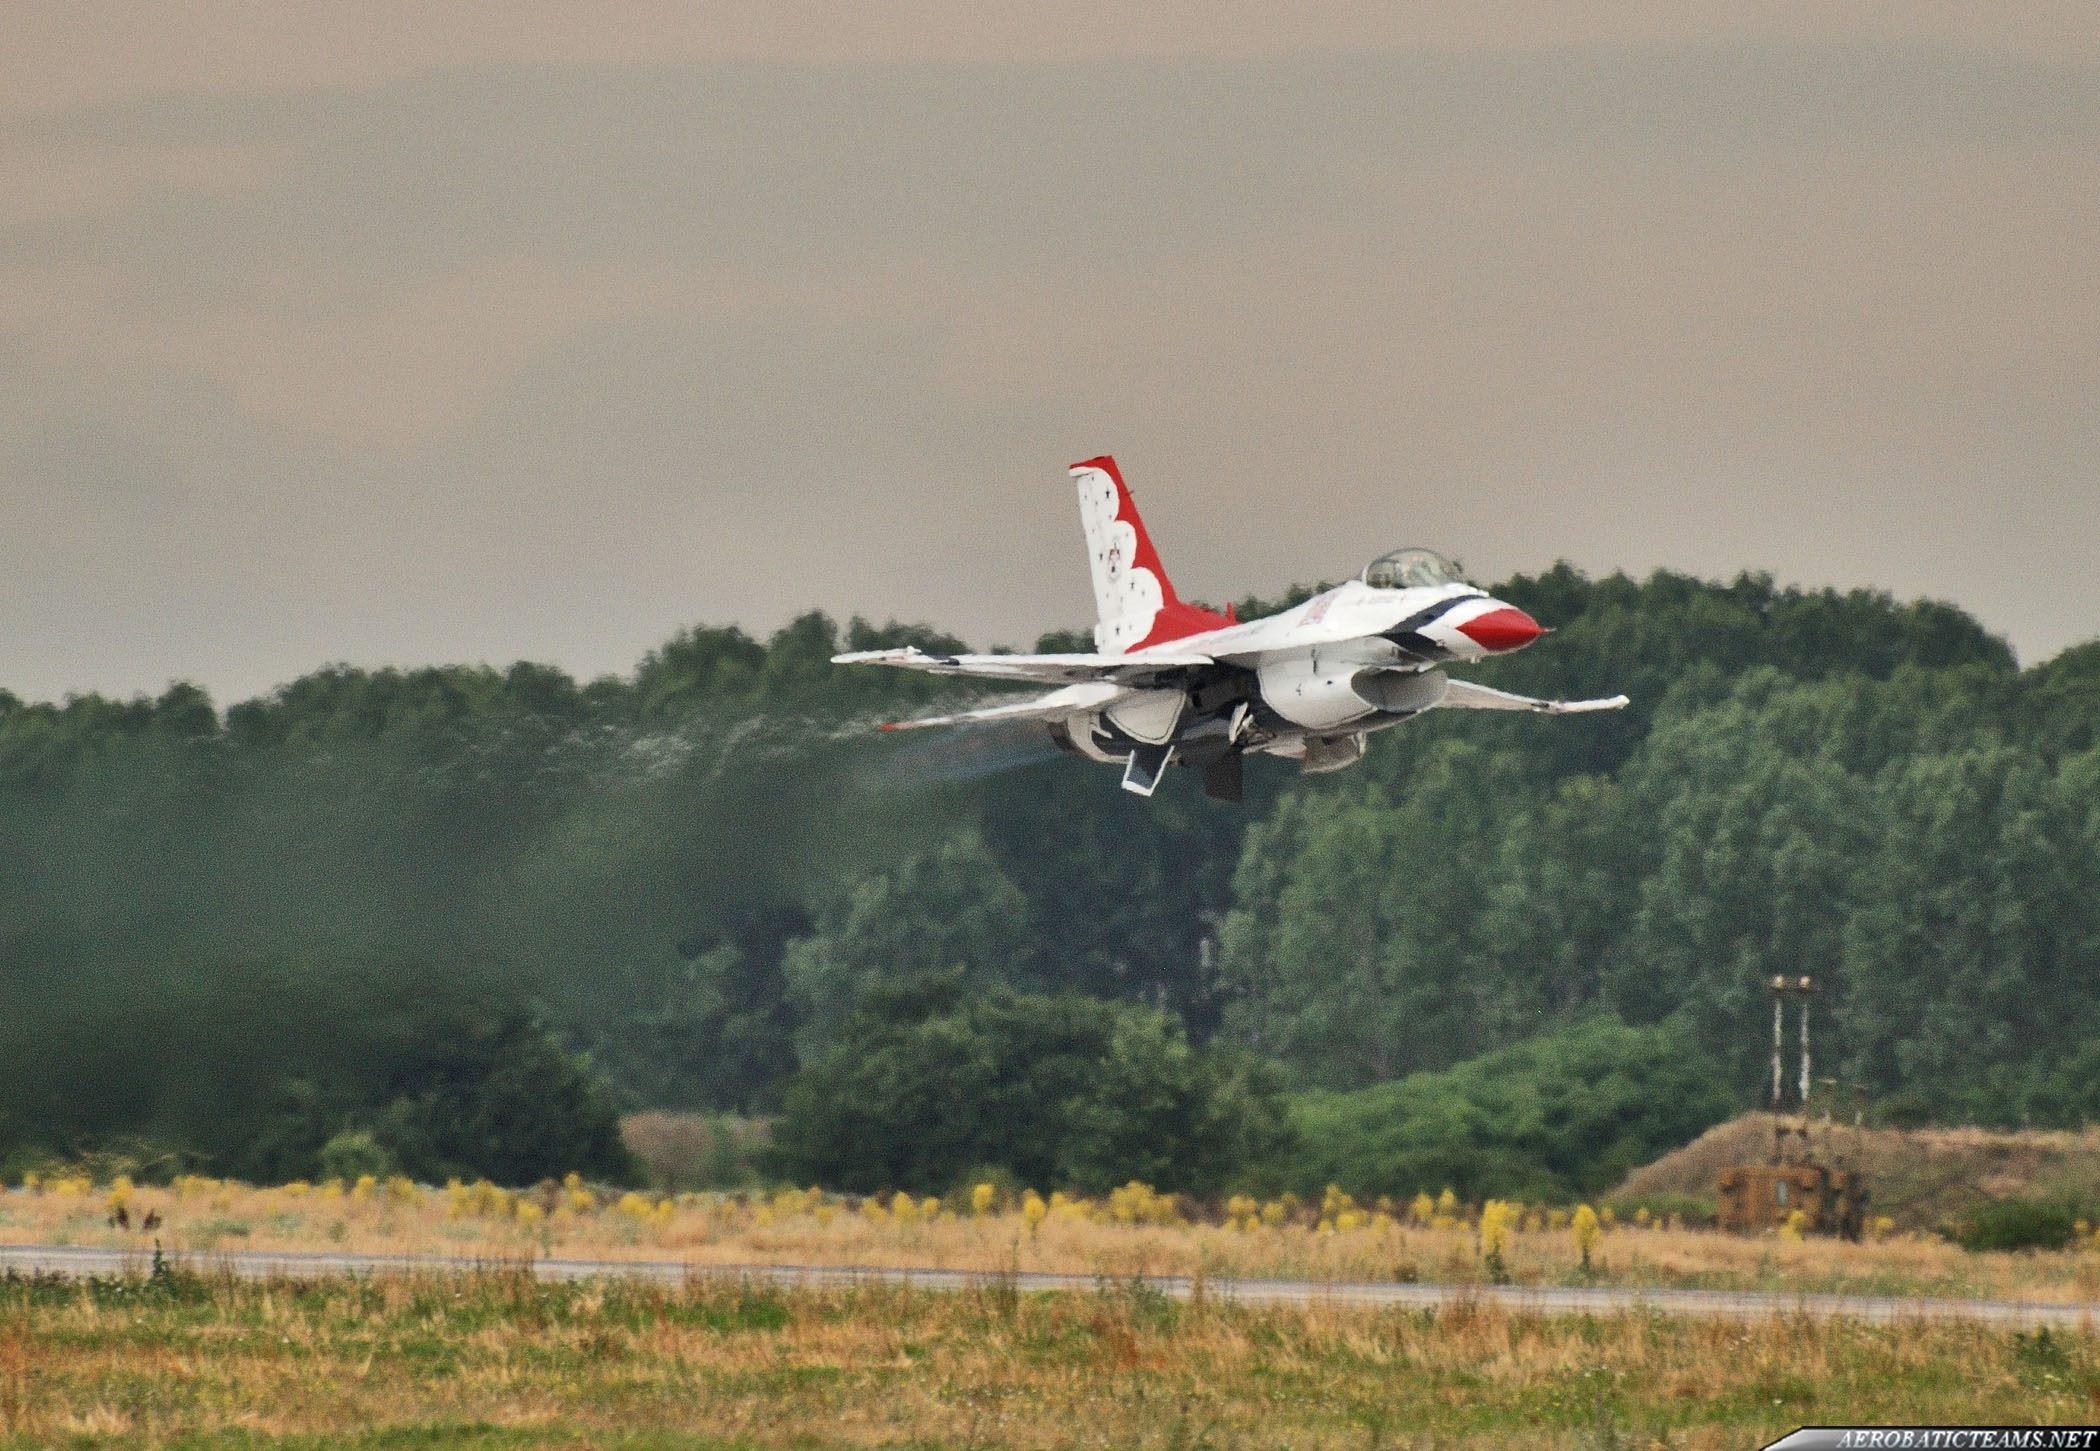 Thunderbirds single aircraft take off